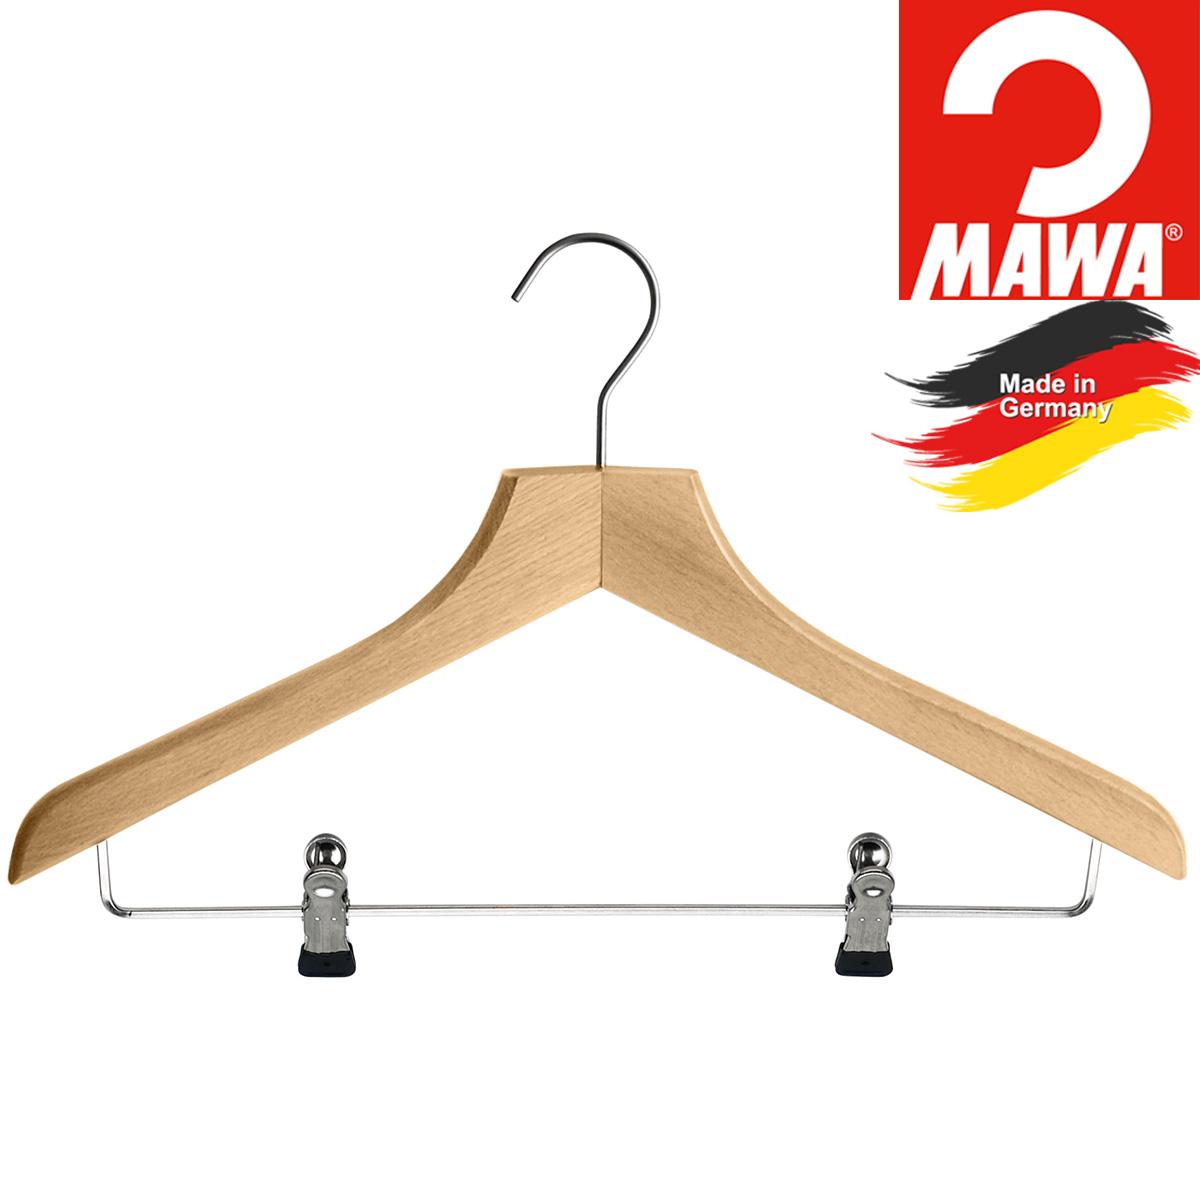 MAWA Komfort Formbügel